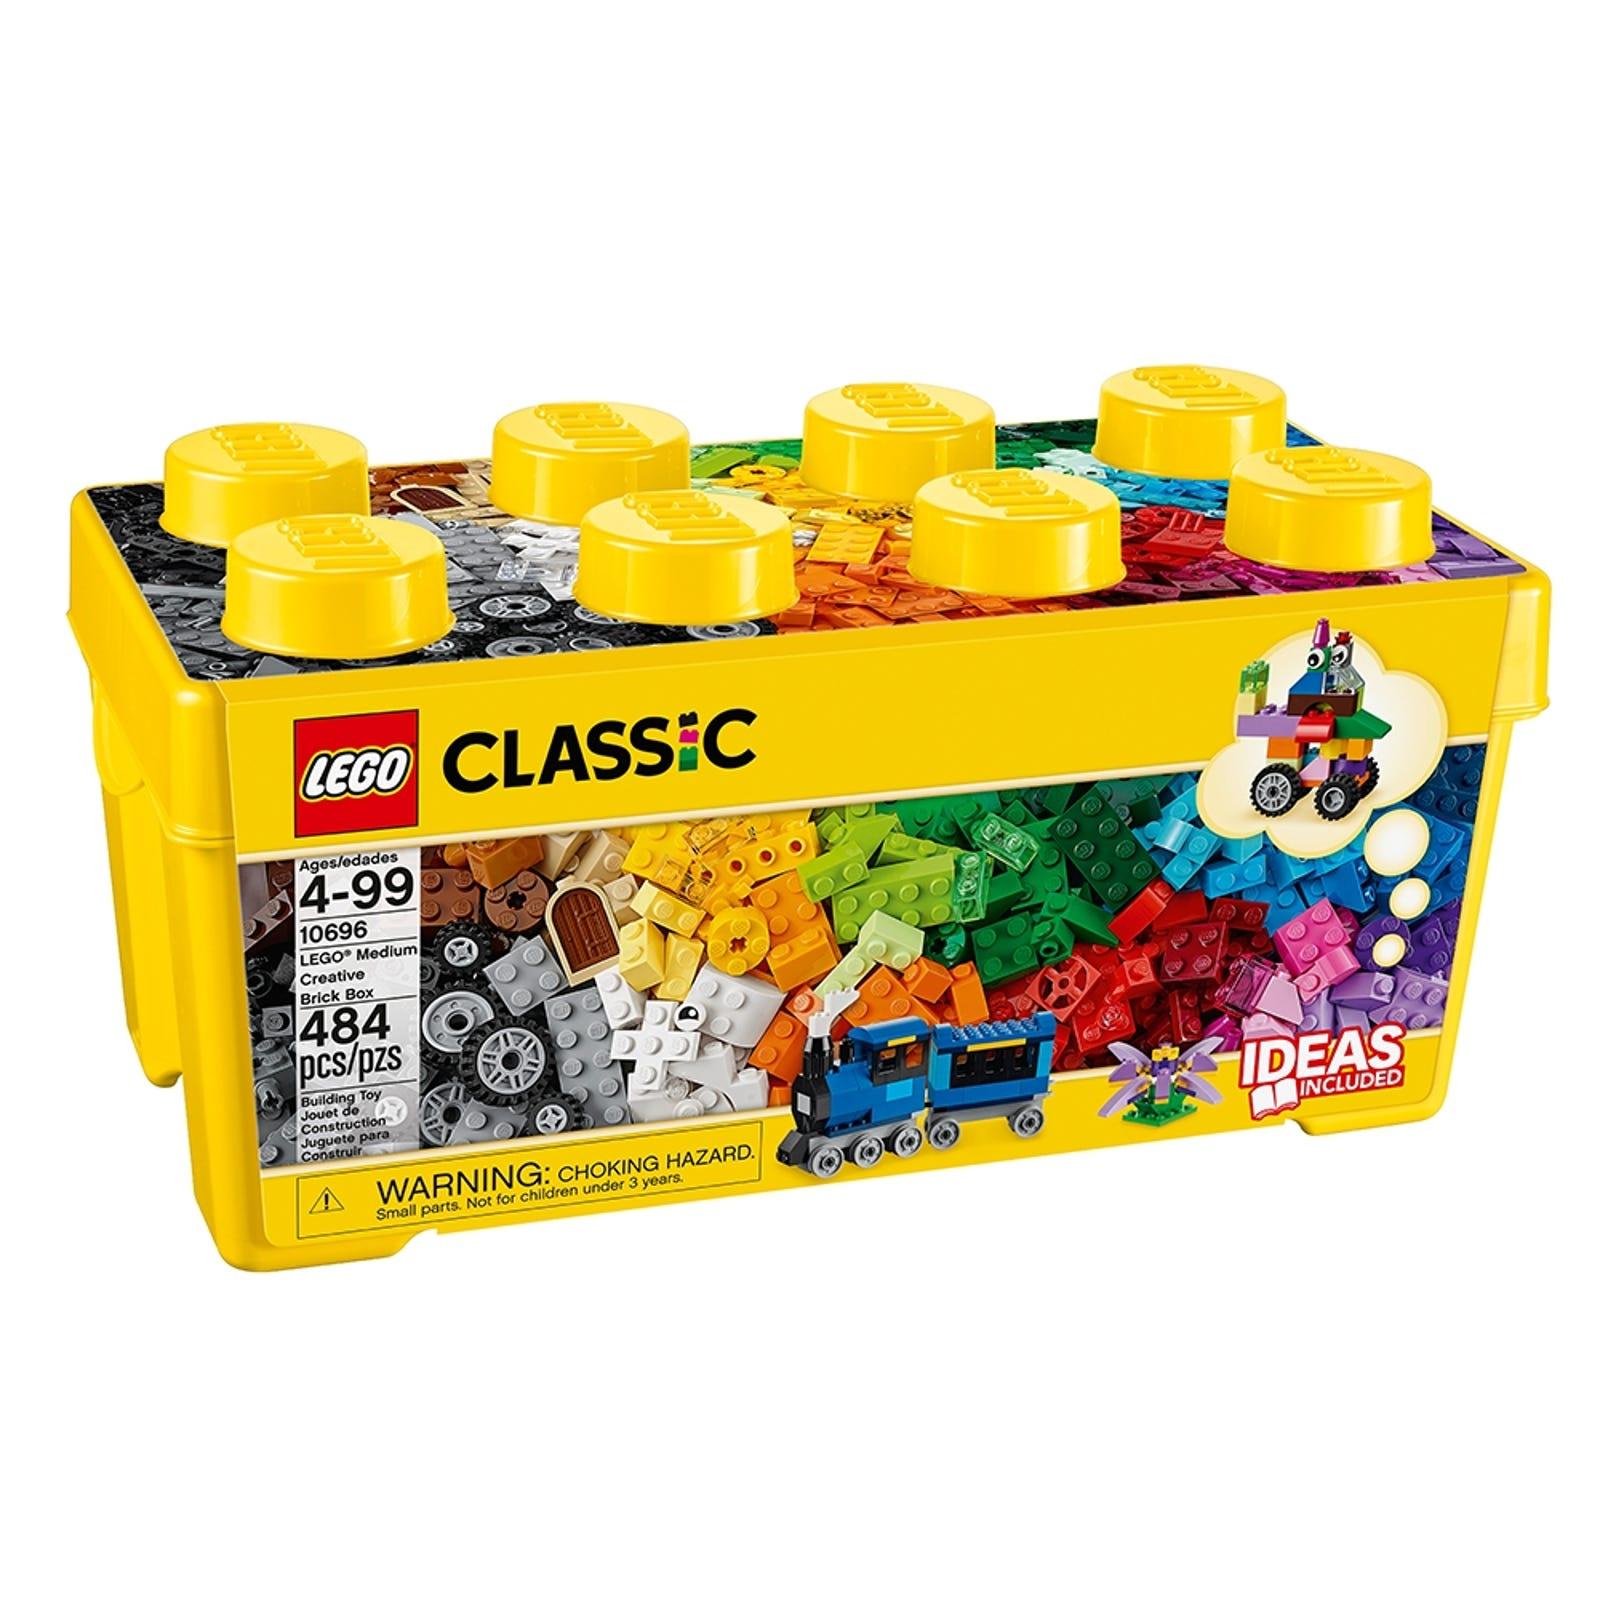 LEGO CLASSIC 484 PZS